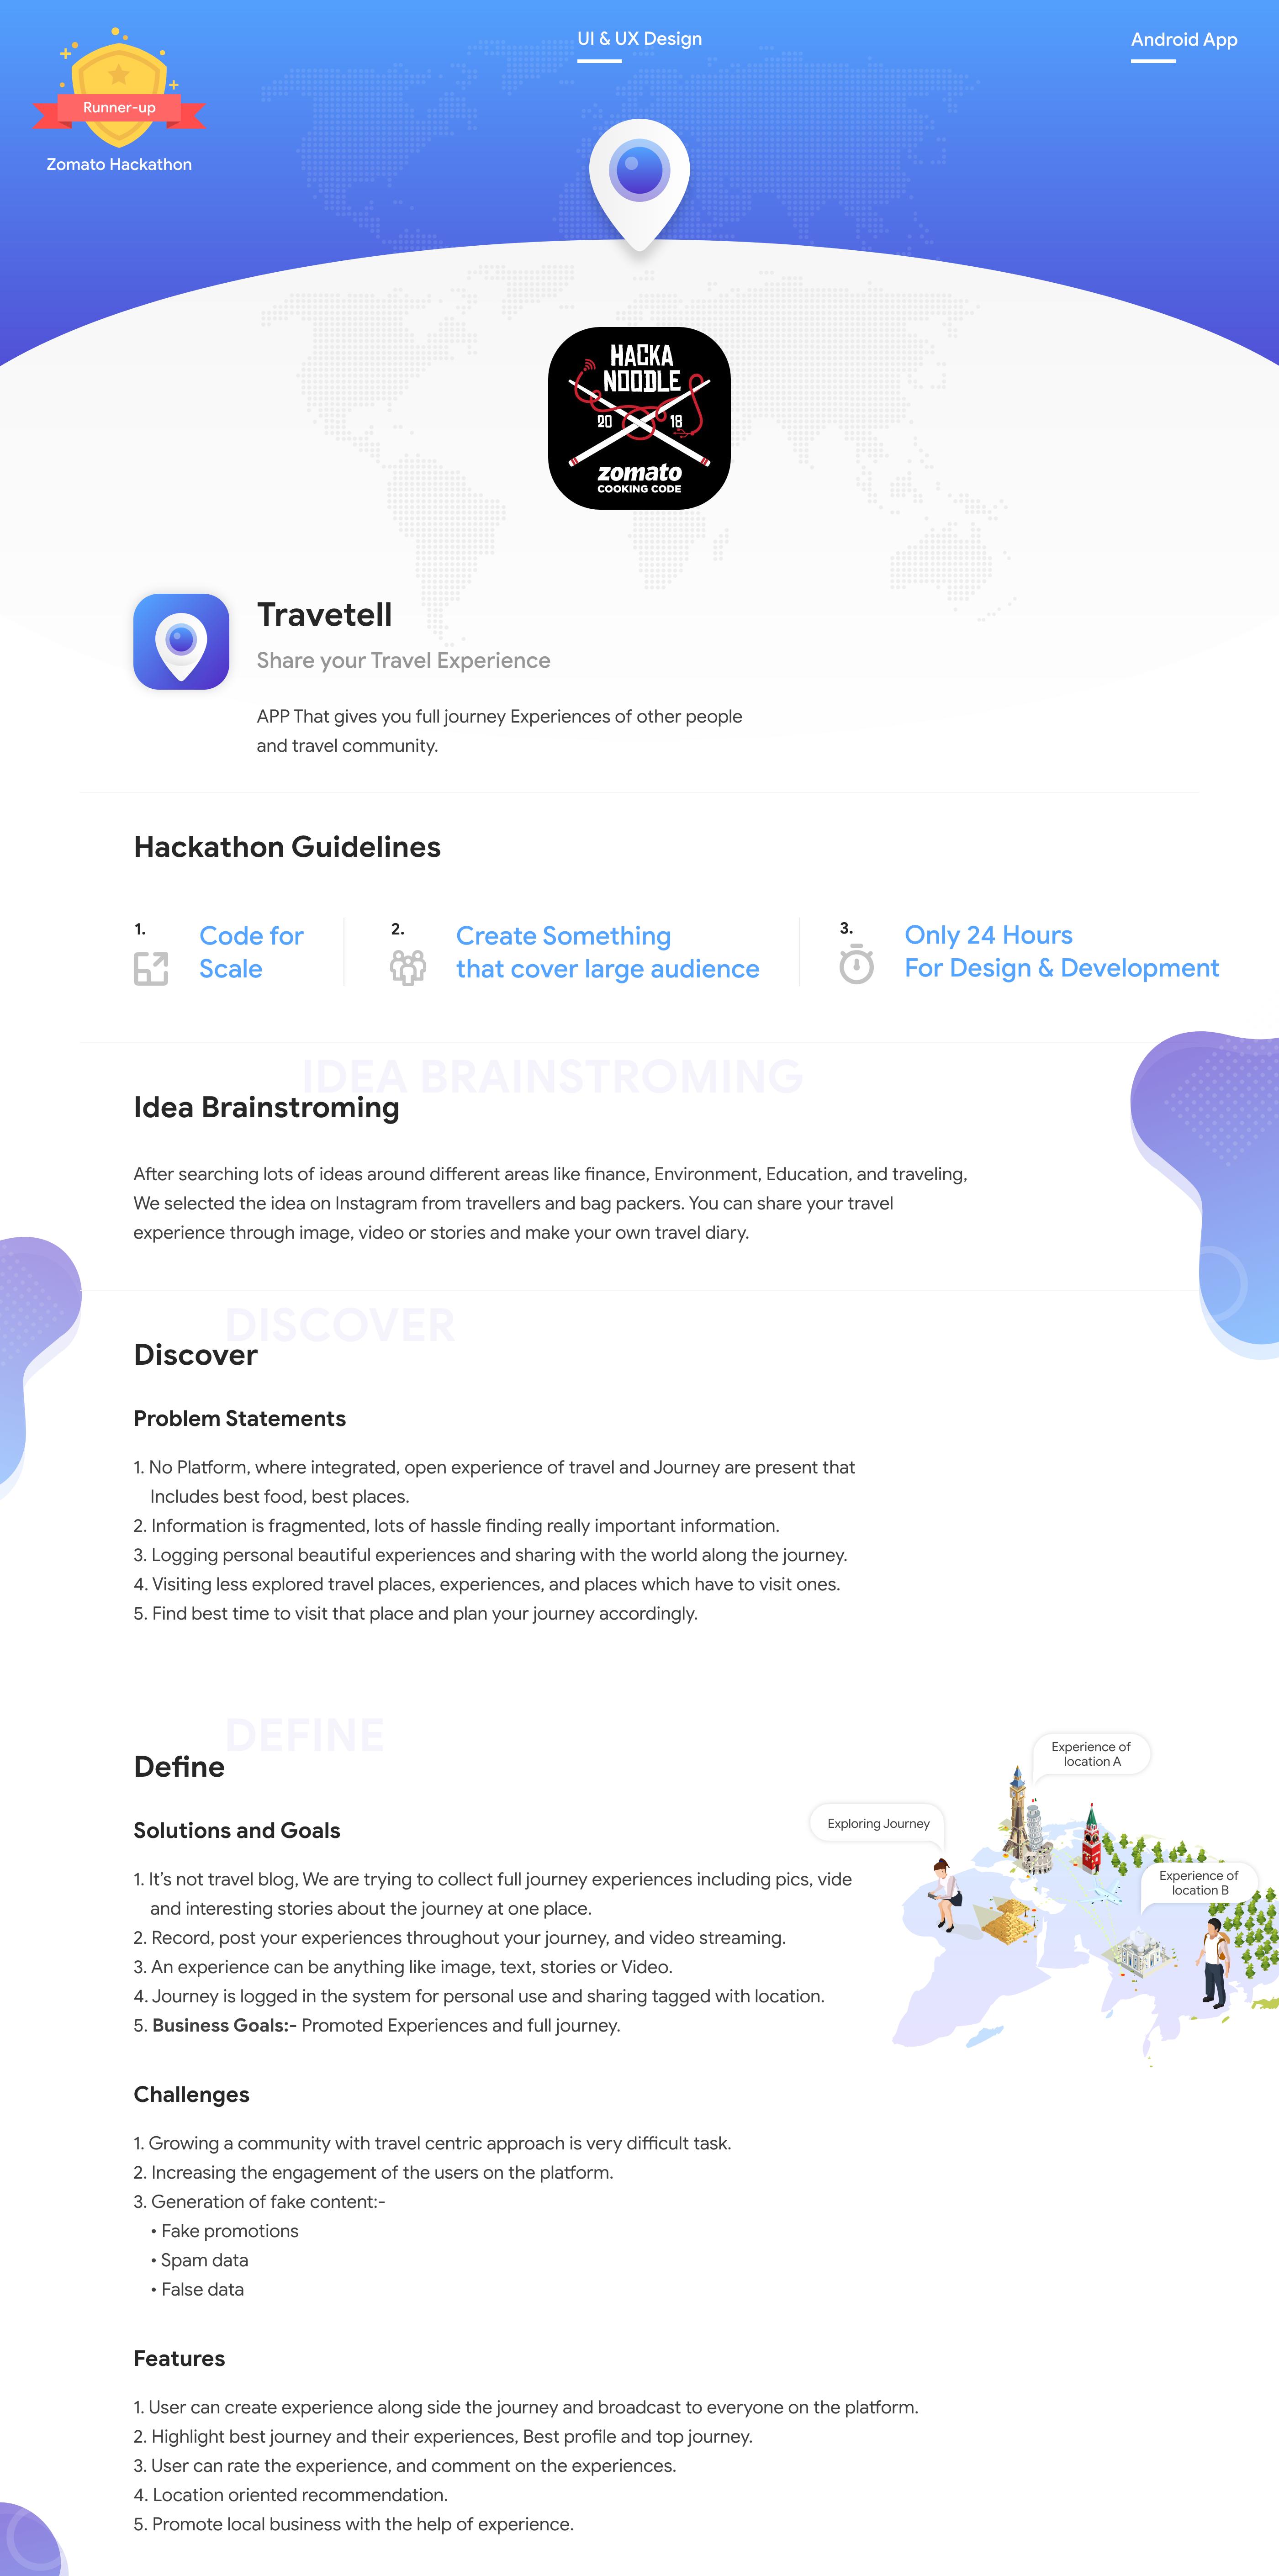 Travetell App UI & UX | Zomato Hackathon Runner-up - UpLabs